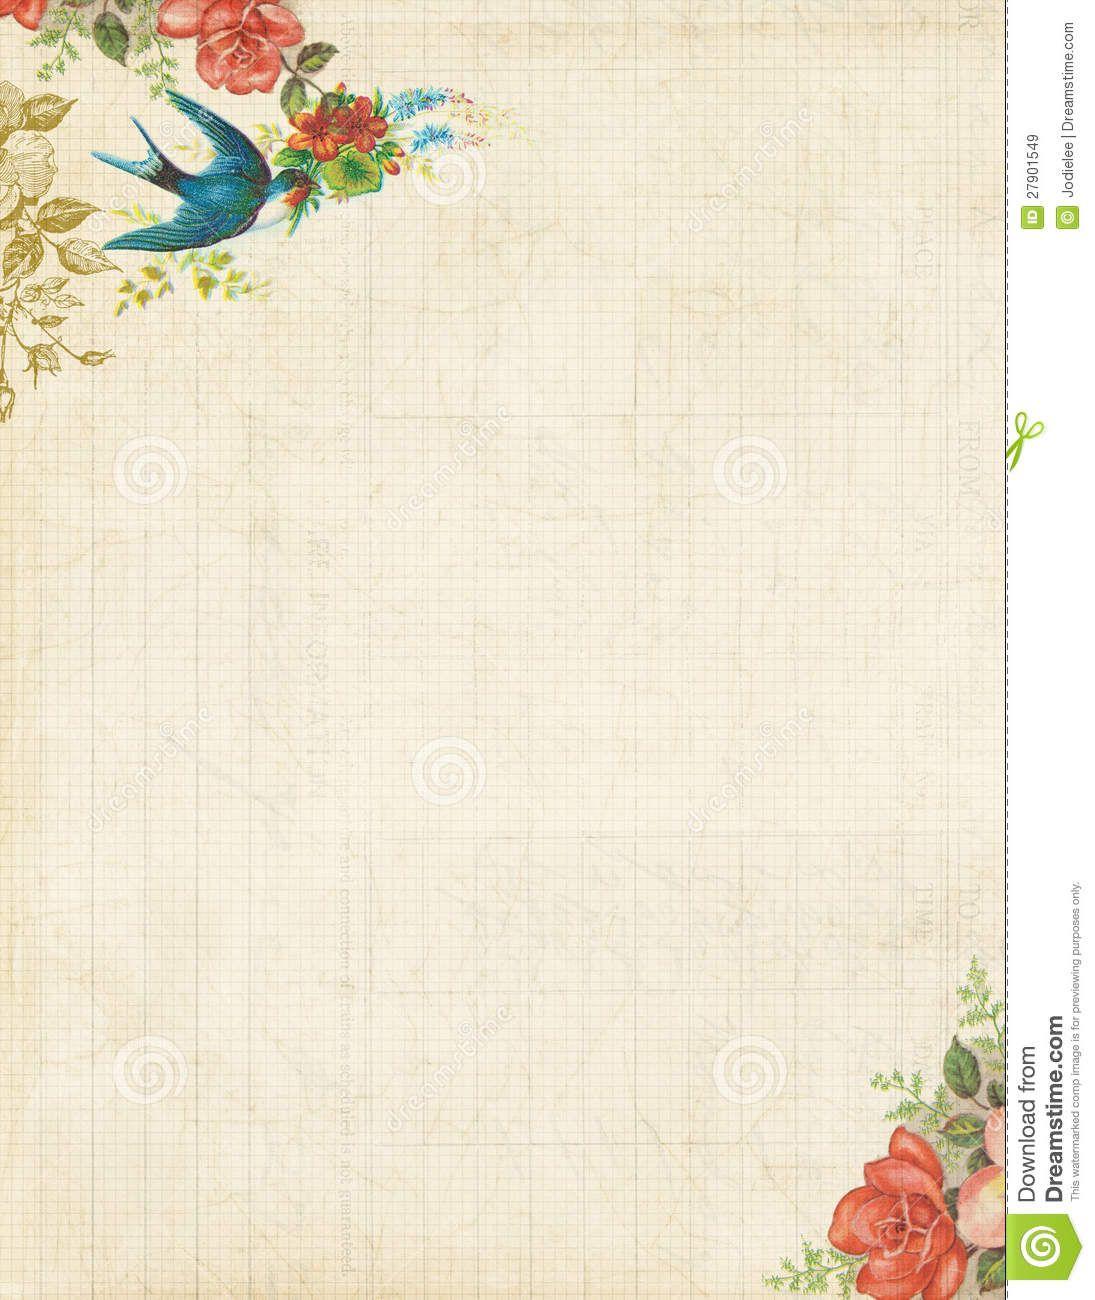 Free Printable Stationery Vintage Backgrounds - 8.4.kaartenstemp.nl • - Free Printable Stationary